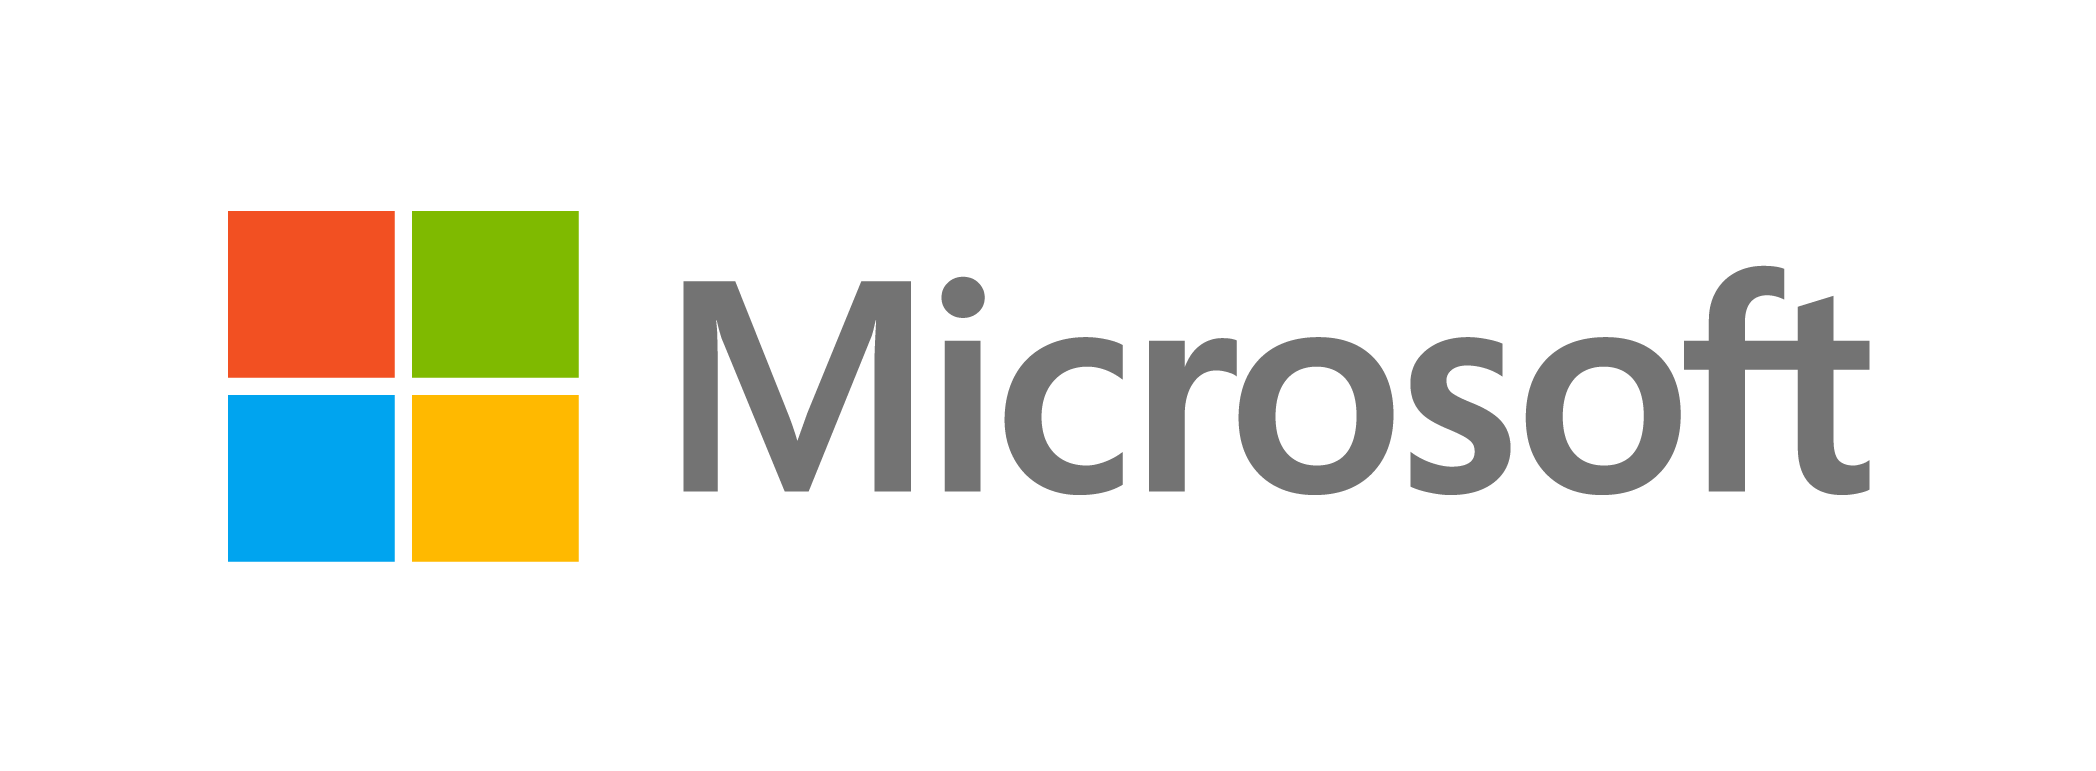 """""Microsoft"